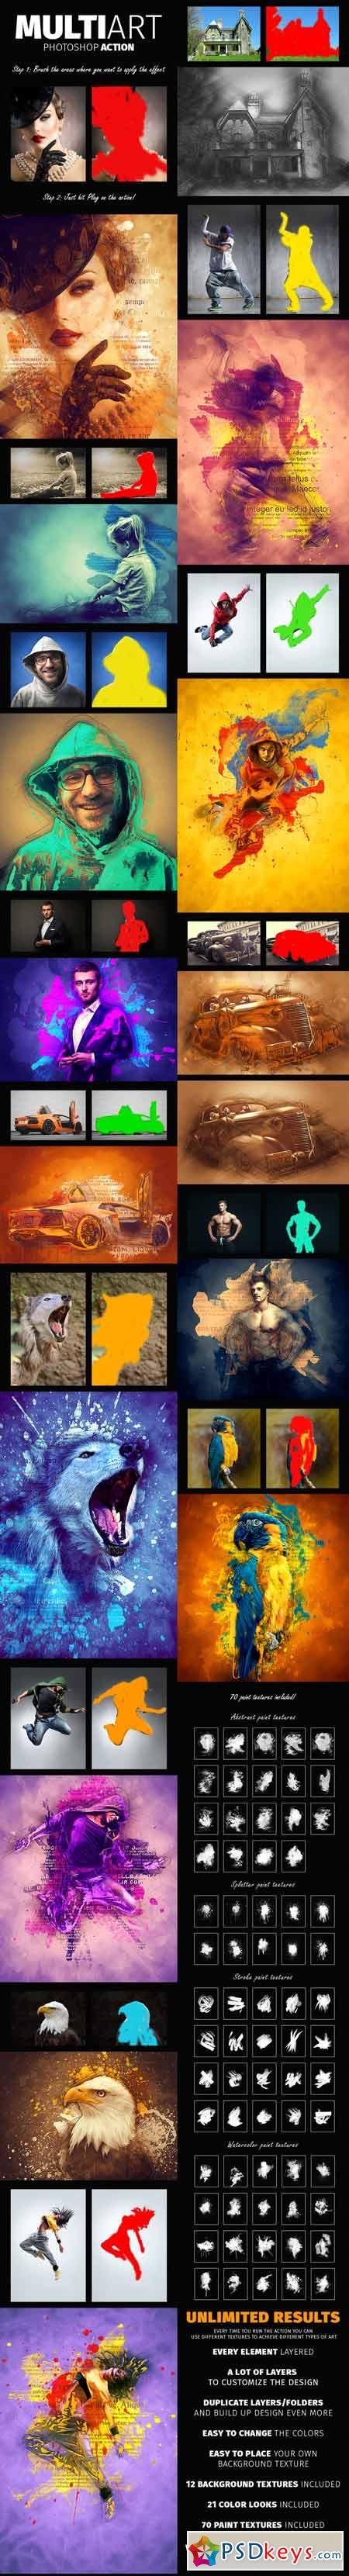 Adobe Photoshop CC 2017 32/64 Bit download torrent ...